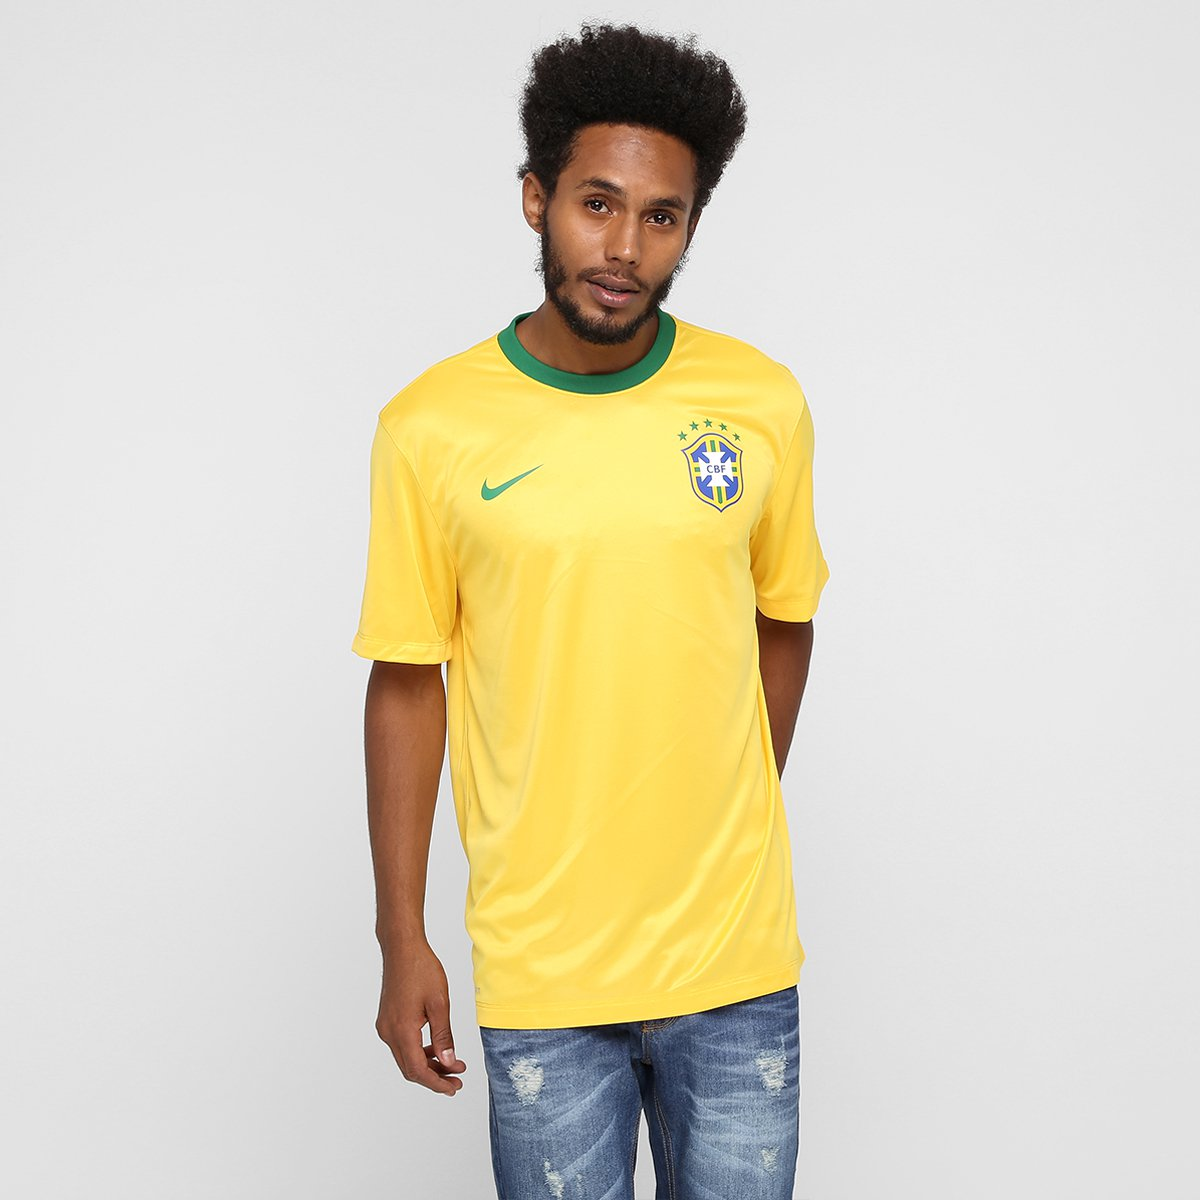 Camiseta Selecao Brasil Nike 2014 Torcedor Masculina Amarelo Verde Netshoes